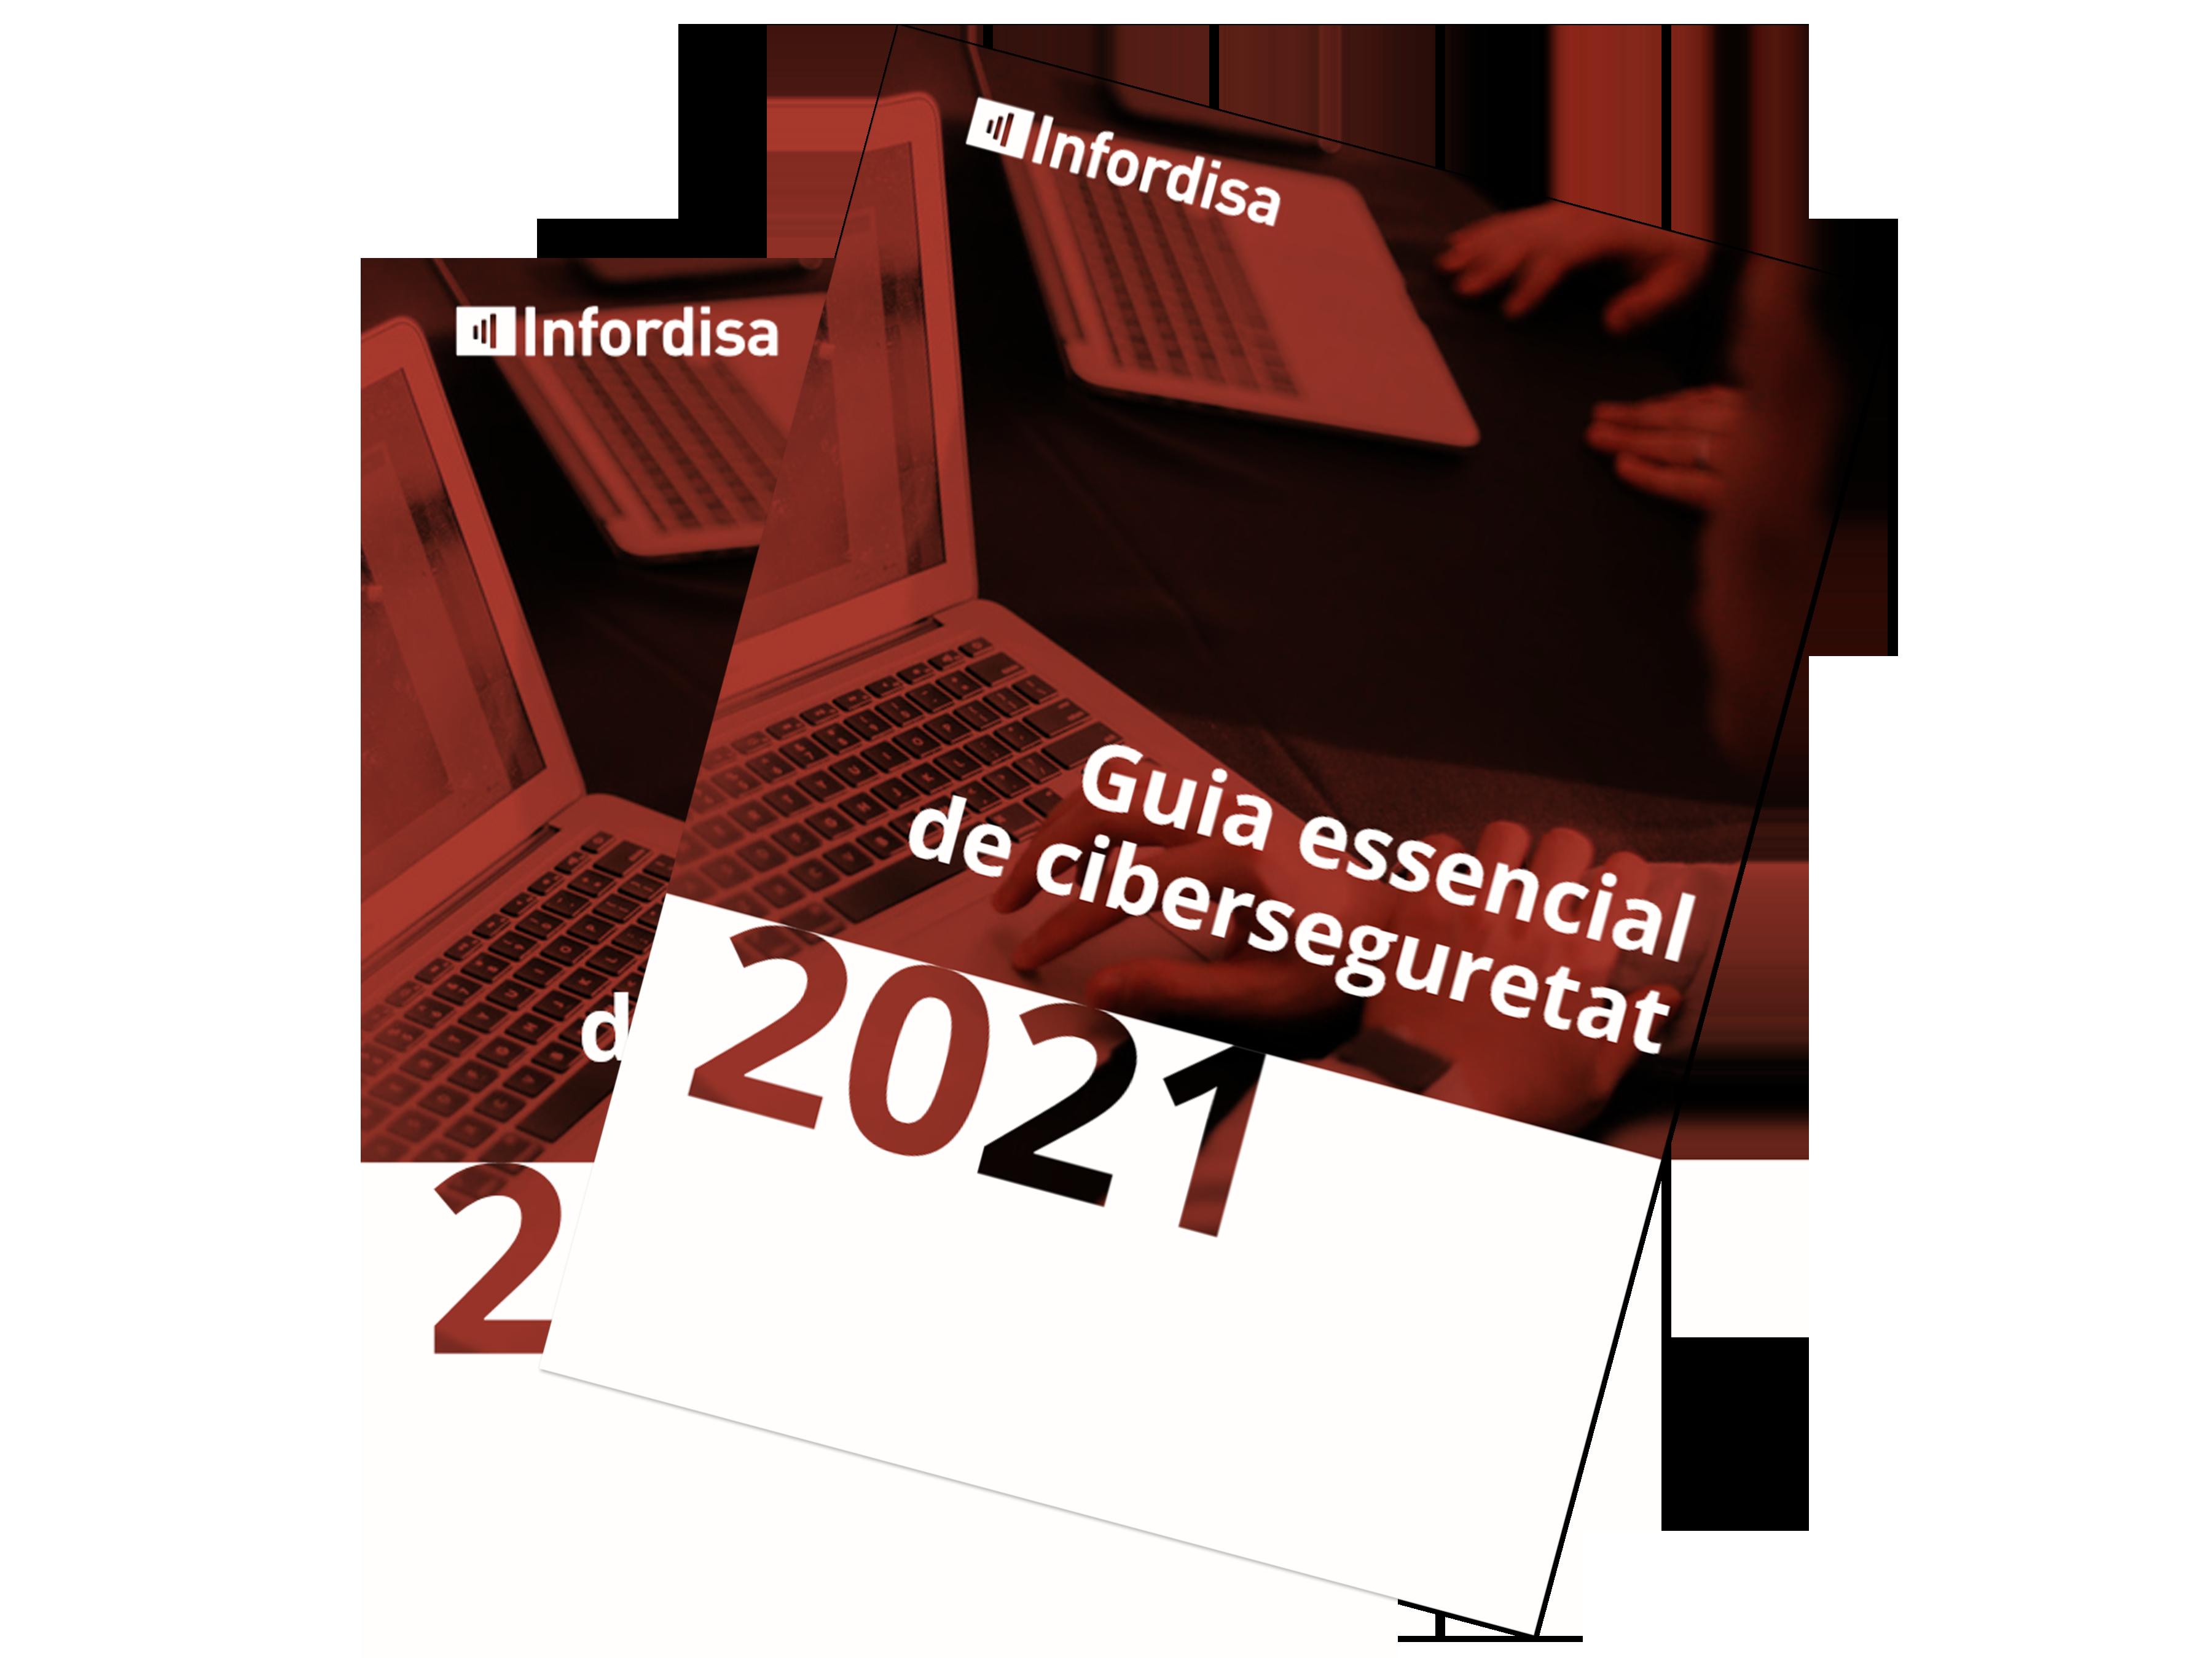 Guia ciberseguridad infordisa 2021